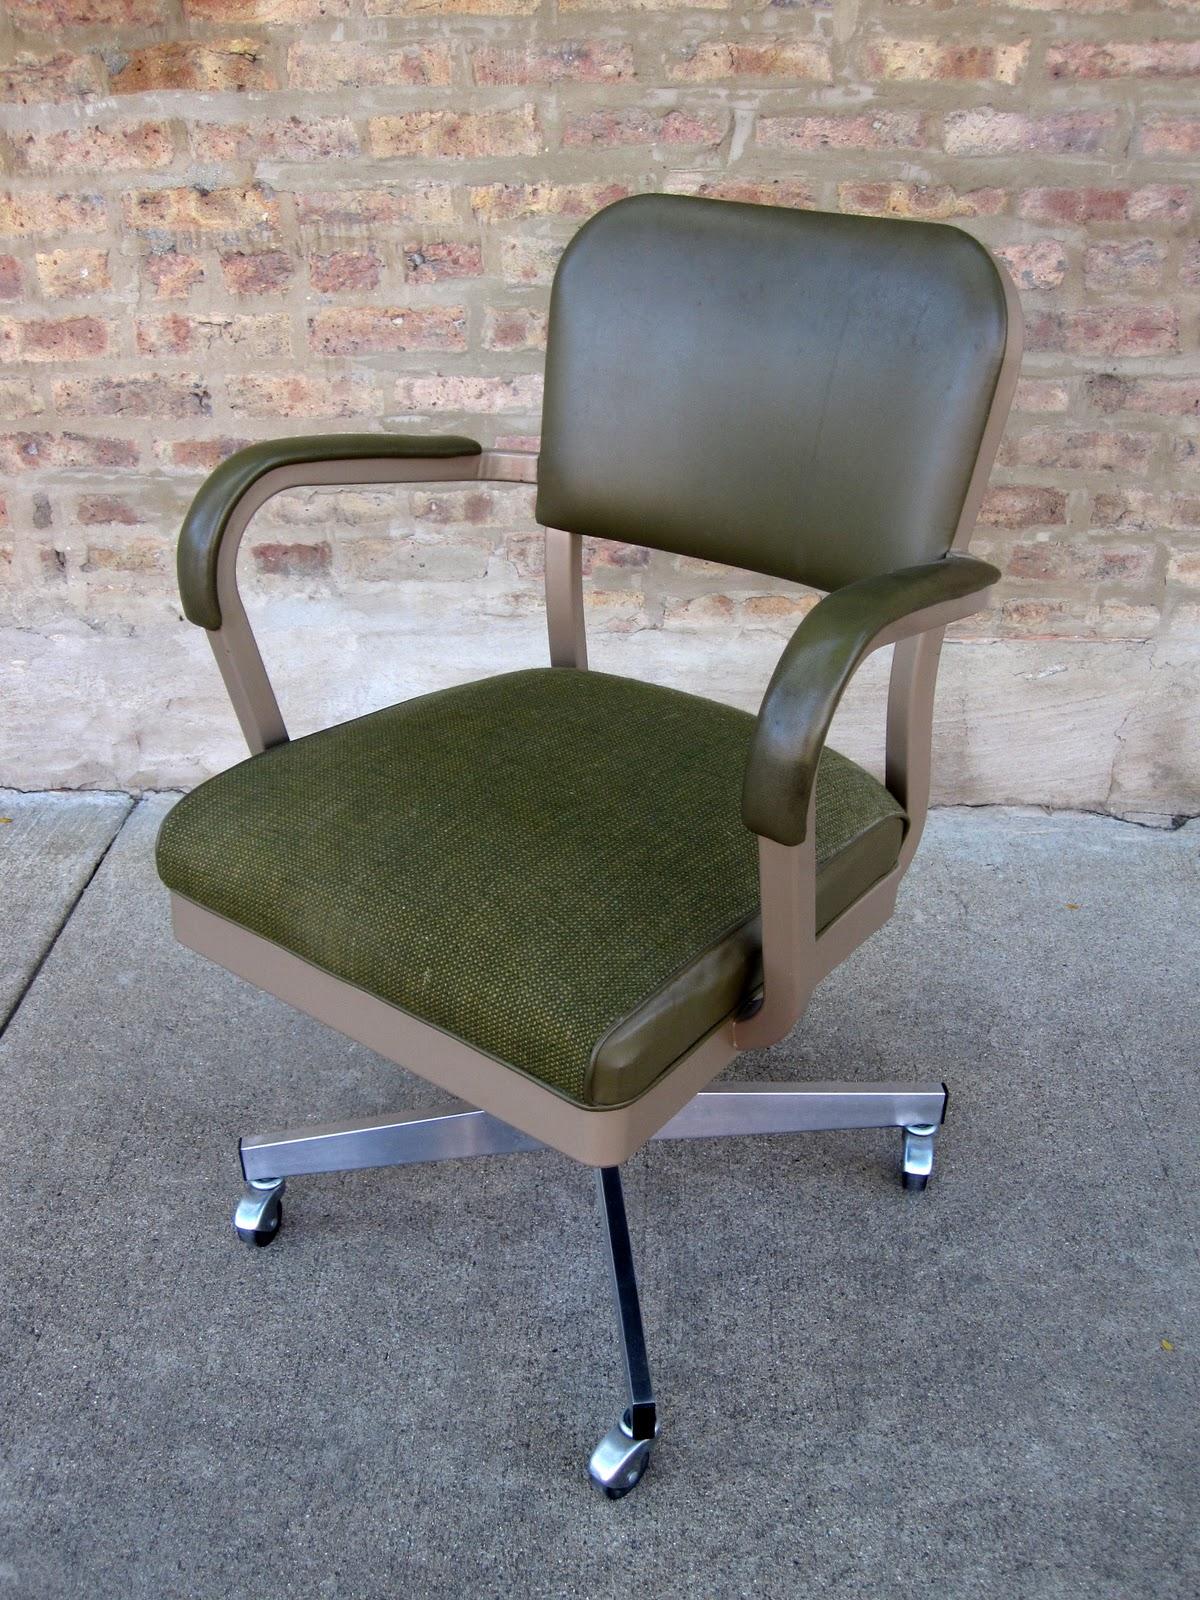 circa midcentury mid century rolling green desk chair